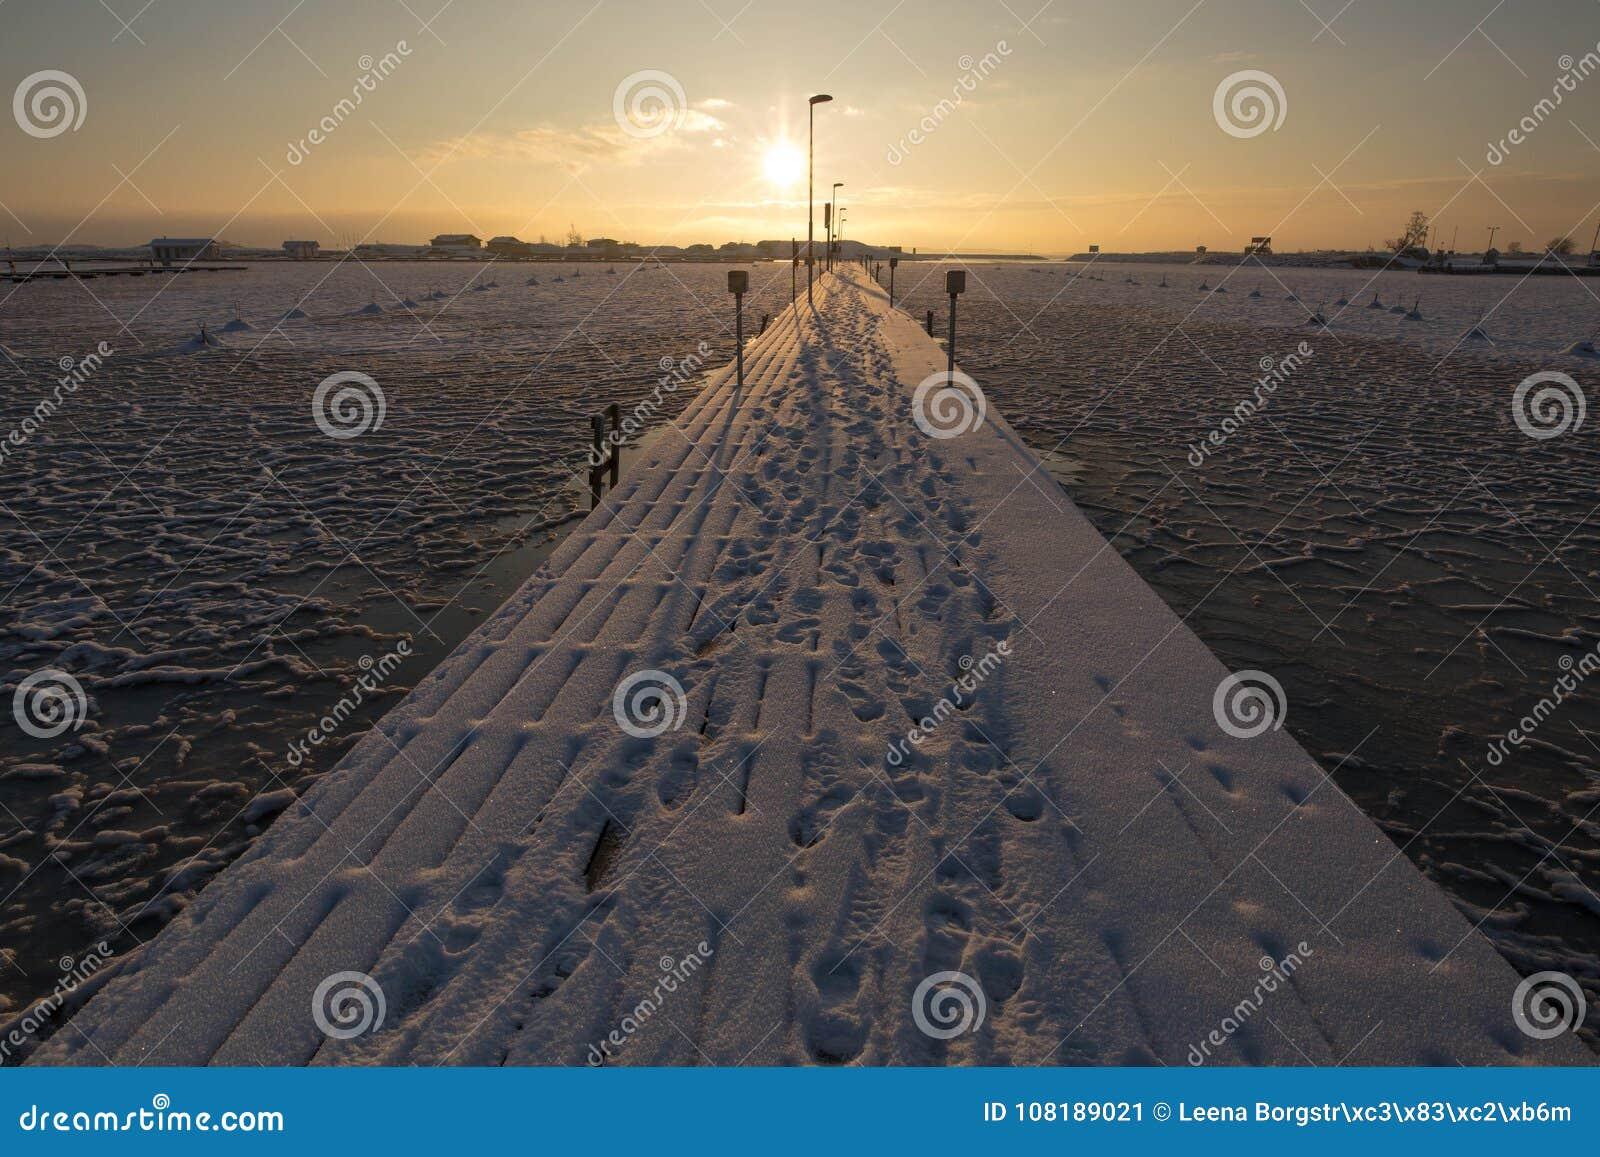 Заход солнца пляжем, проект зимы льда